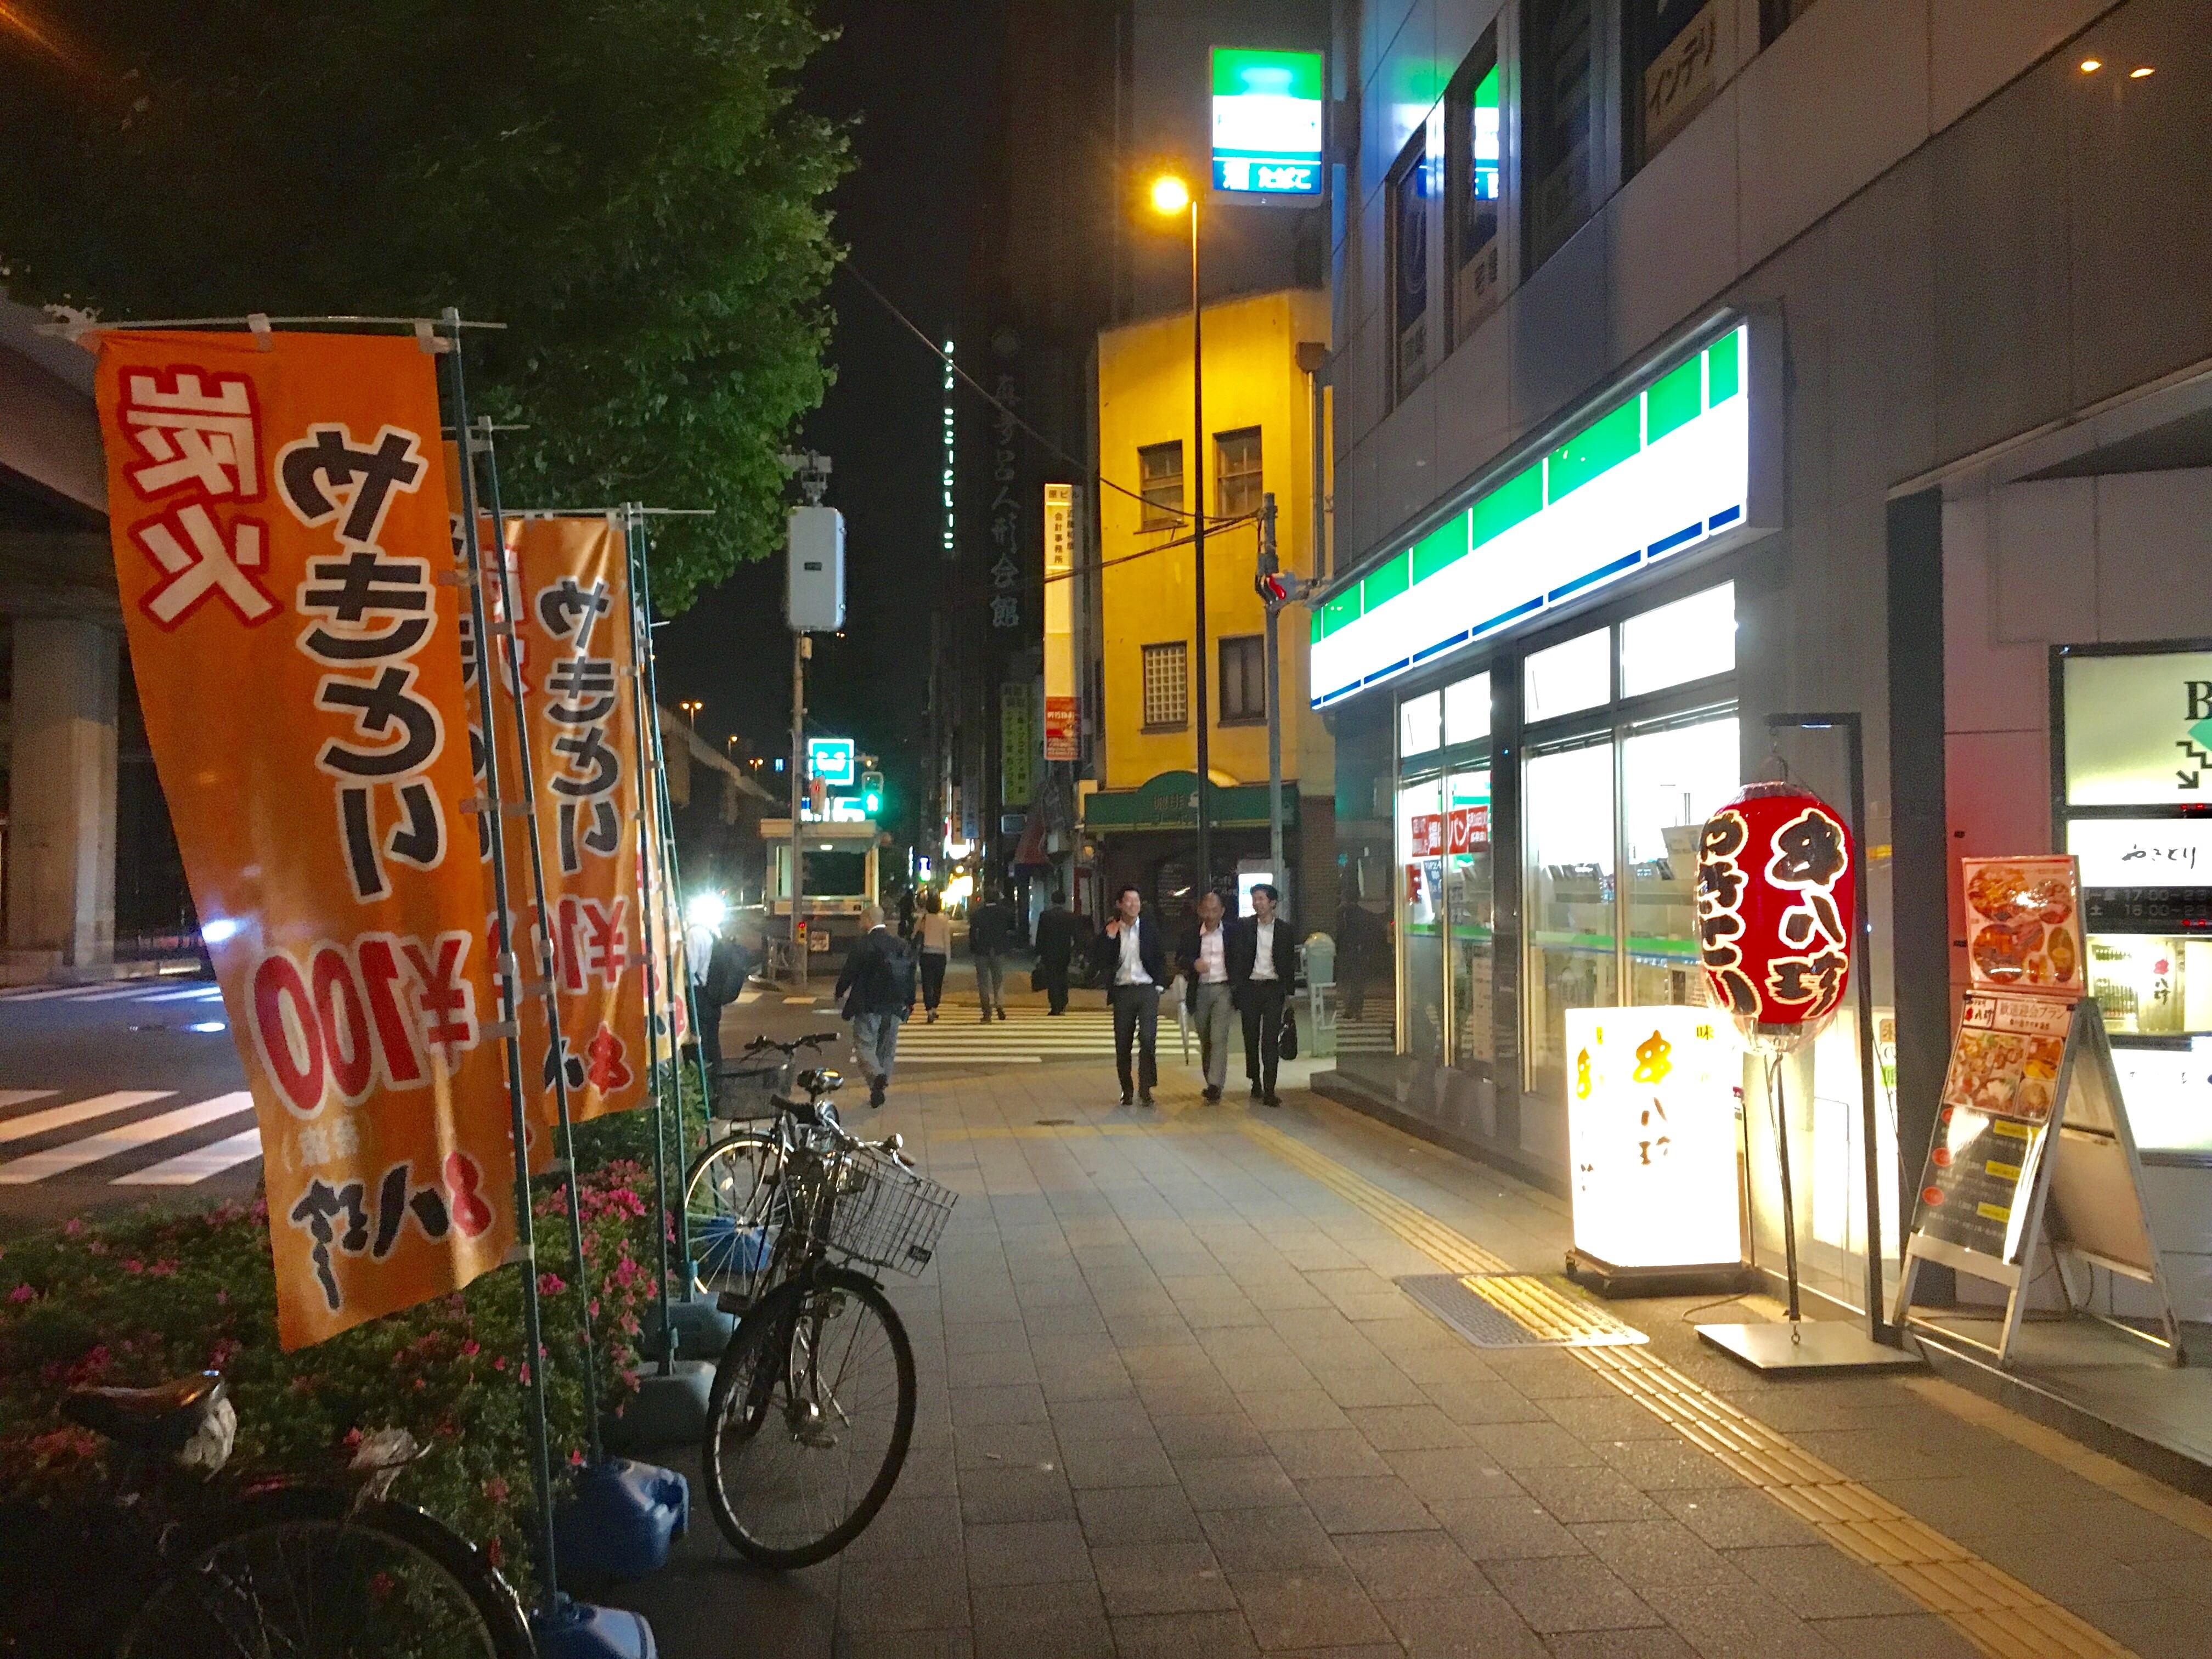 f:id:SoichiroIkeshita:20170606154345j:image